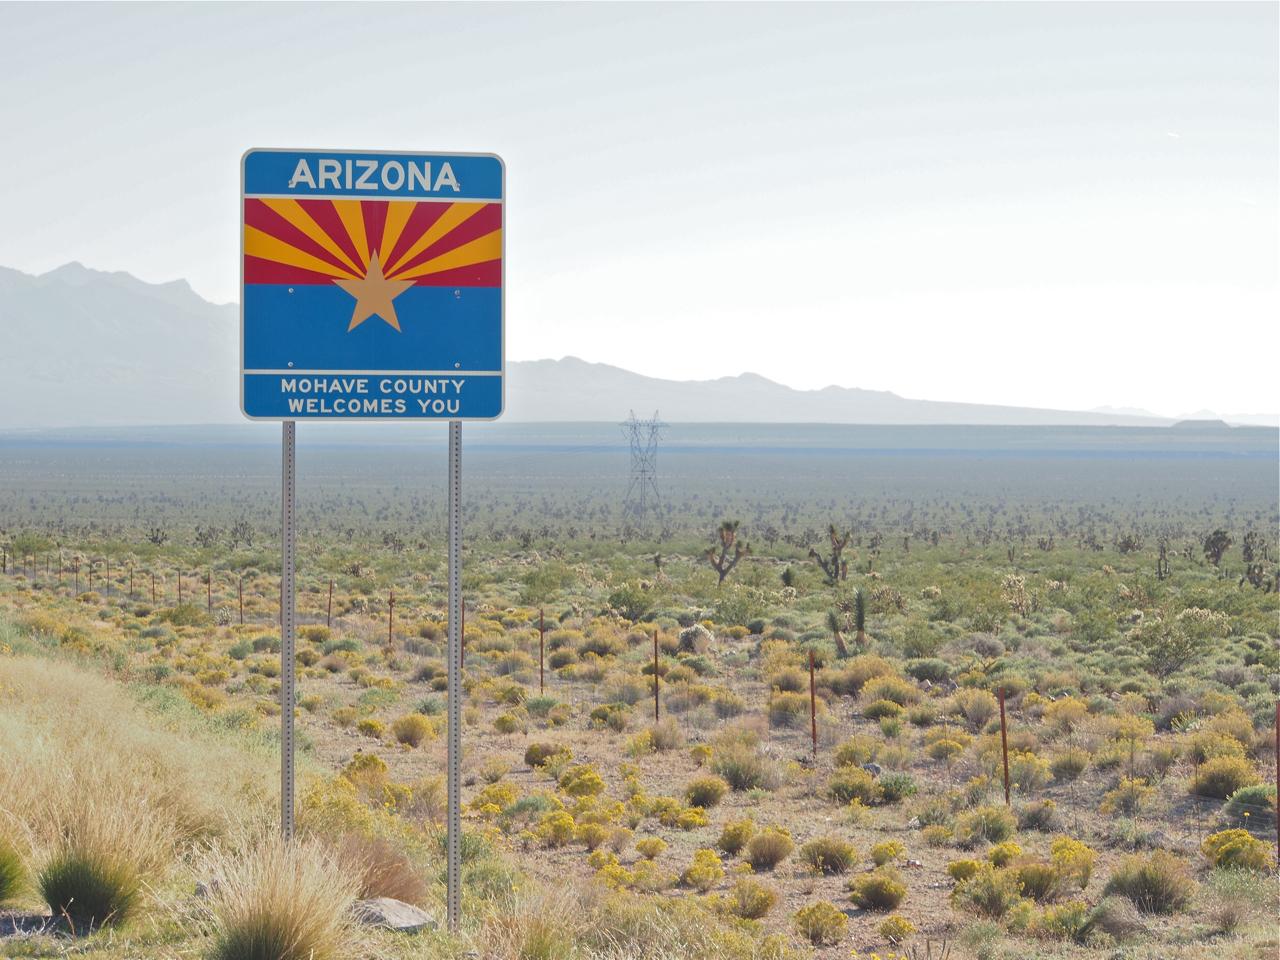 Casino barstow california jocuri online casino sizzling